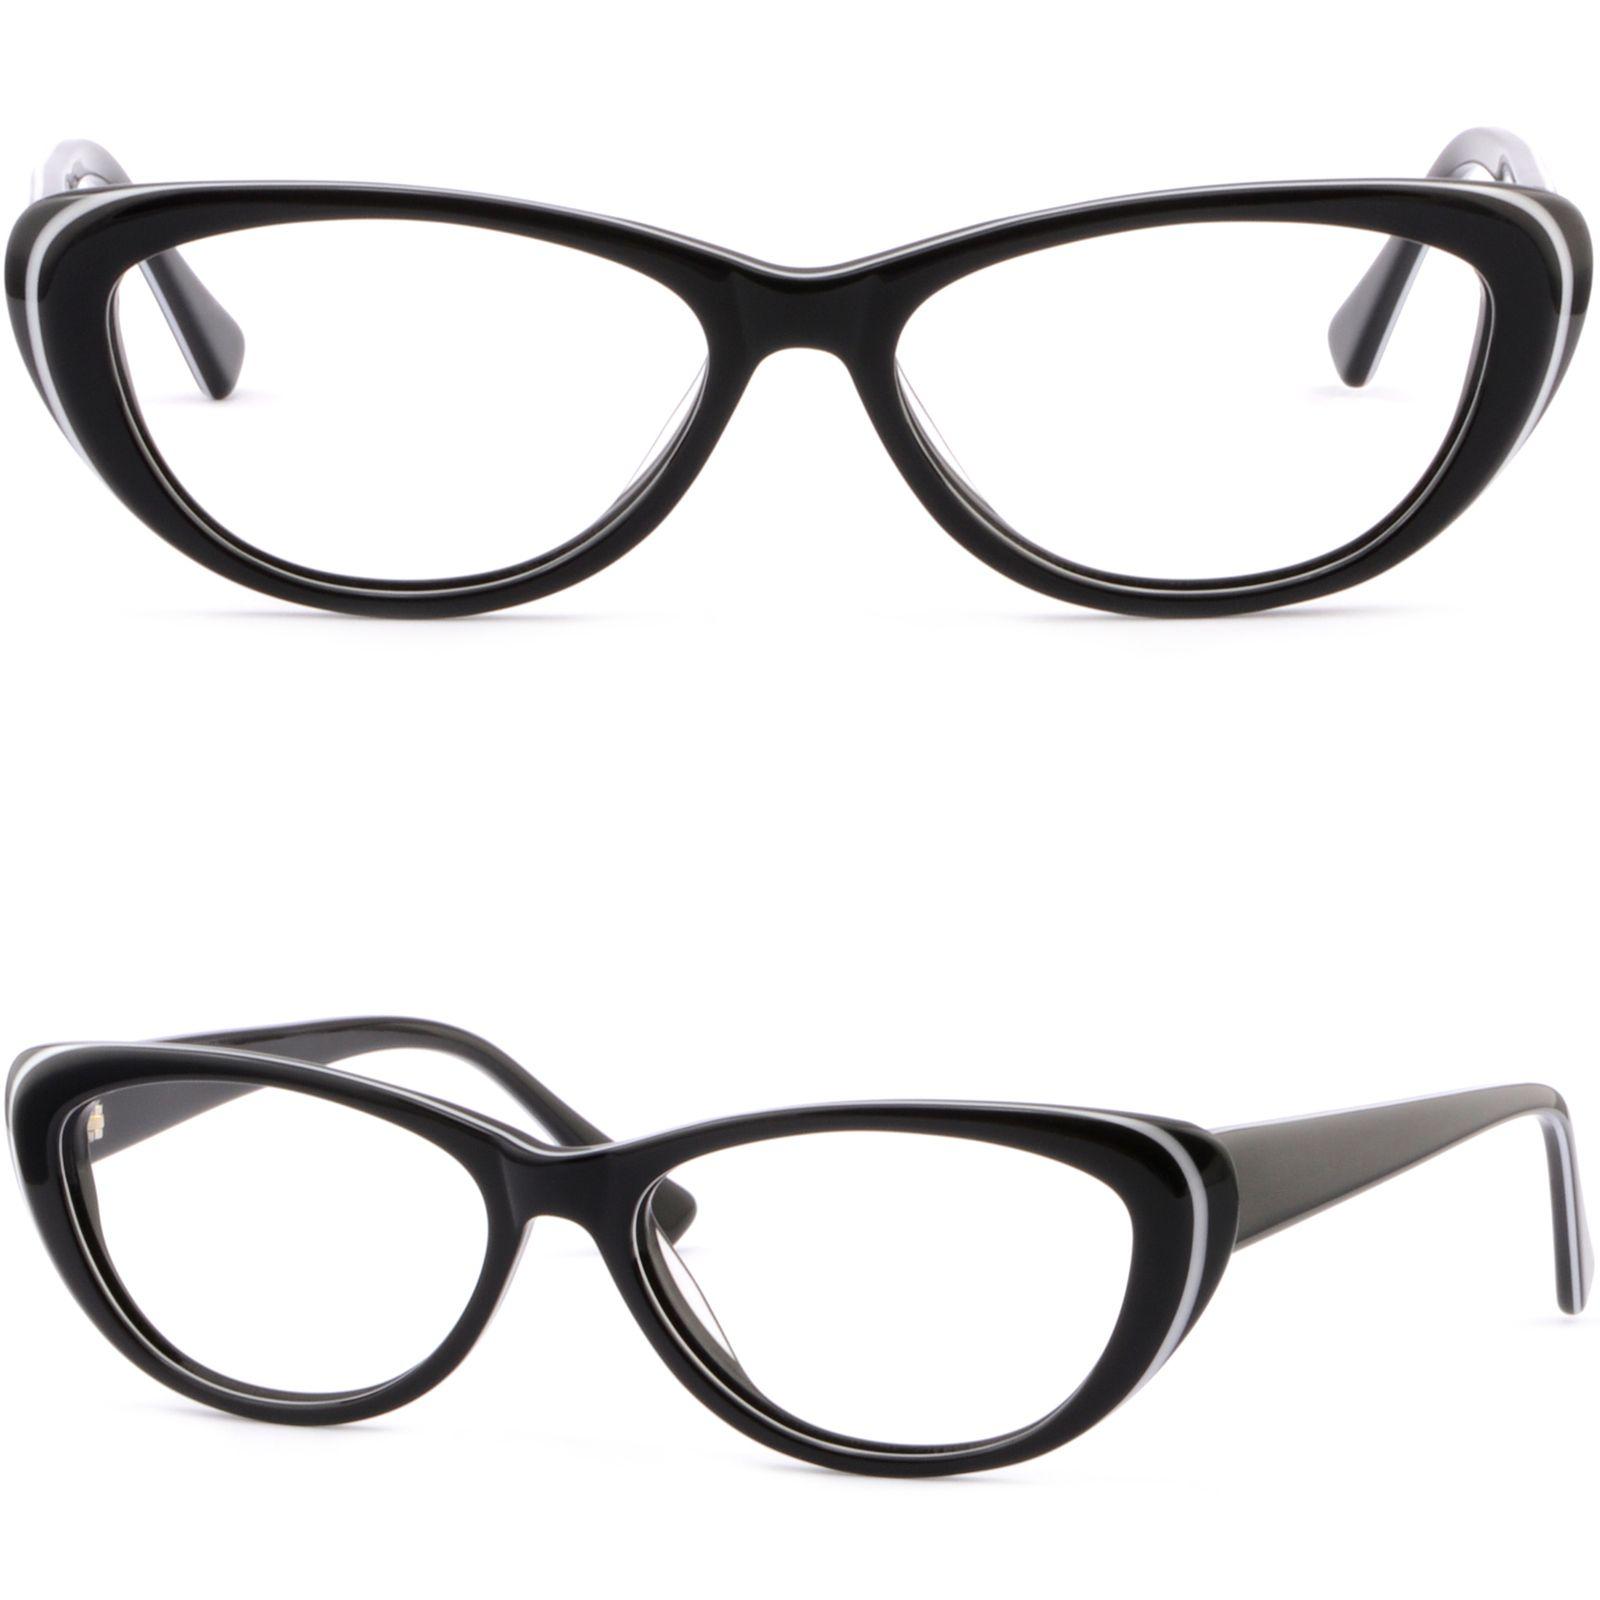 Cateye Plastic Frames Womens Prescription Glasses Eyeglasses Spring Hinges  Black